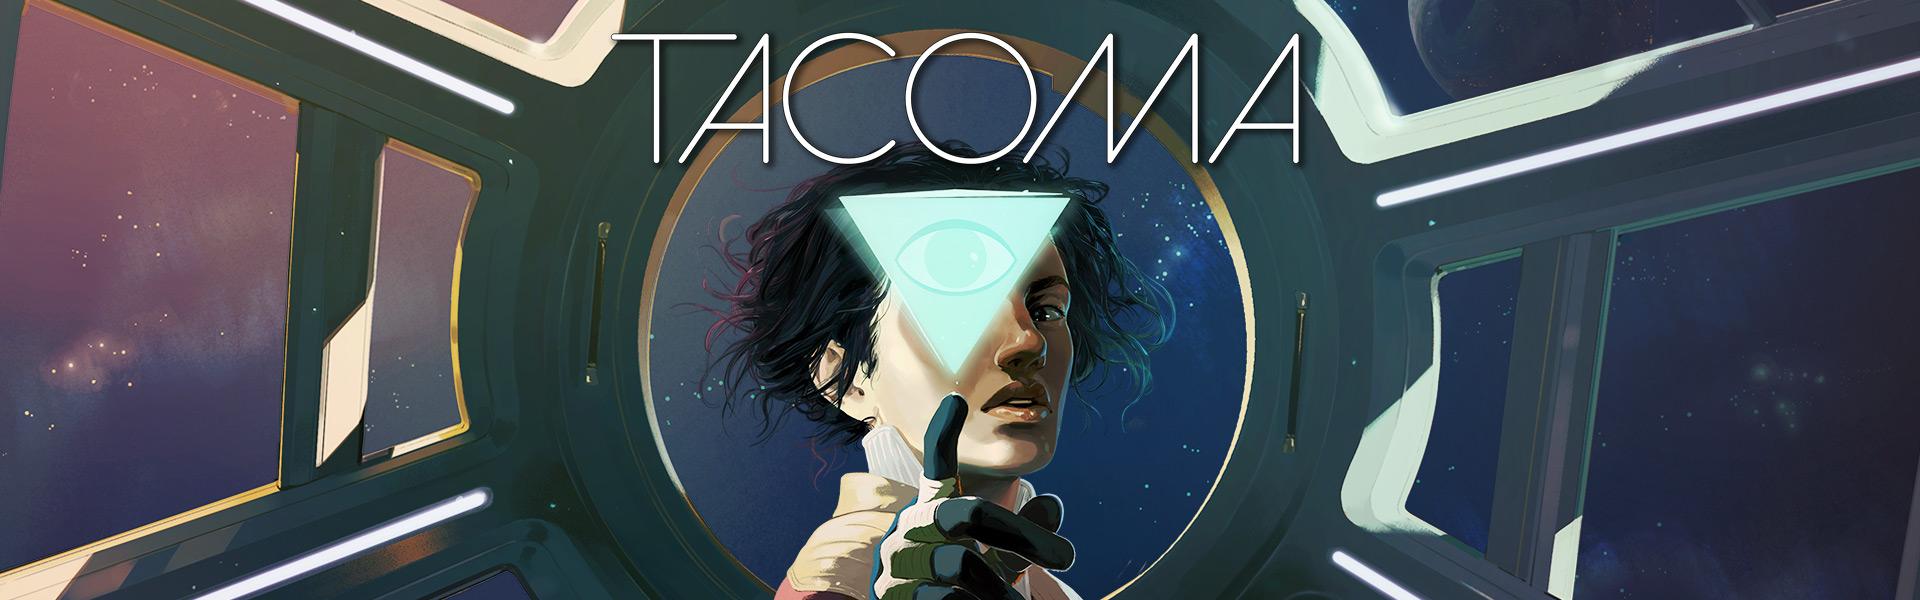 Tacoma主要角色在星空背景下指著 AI